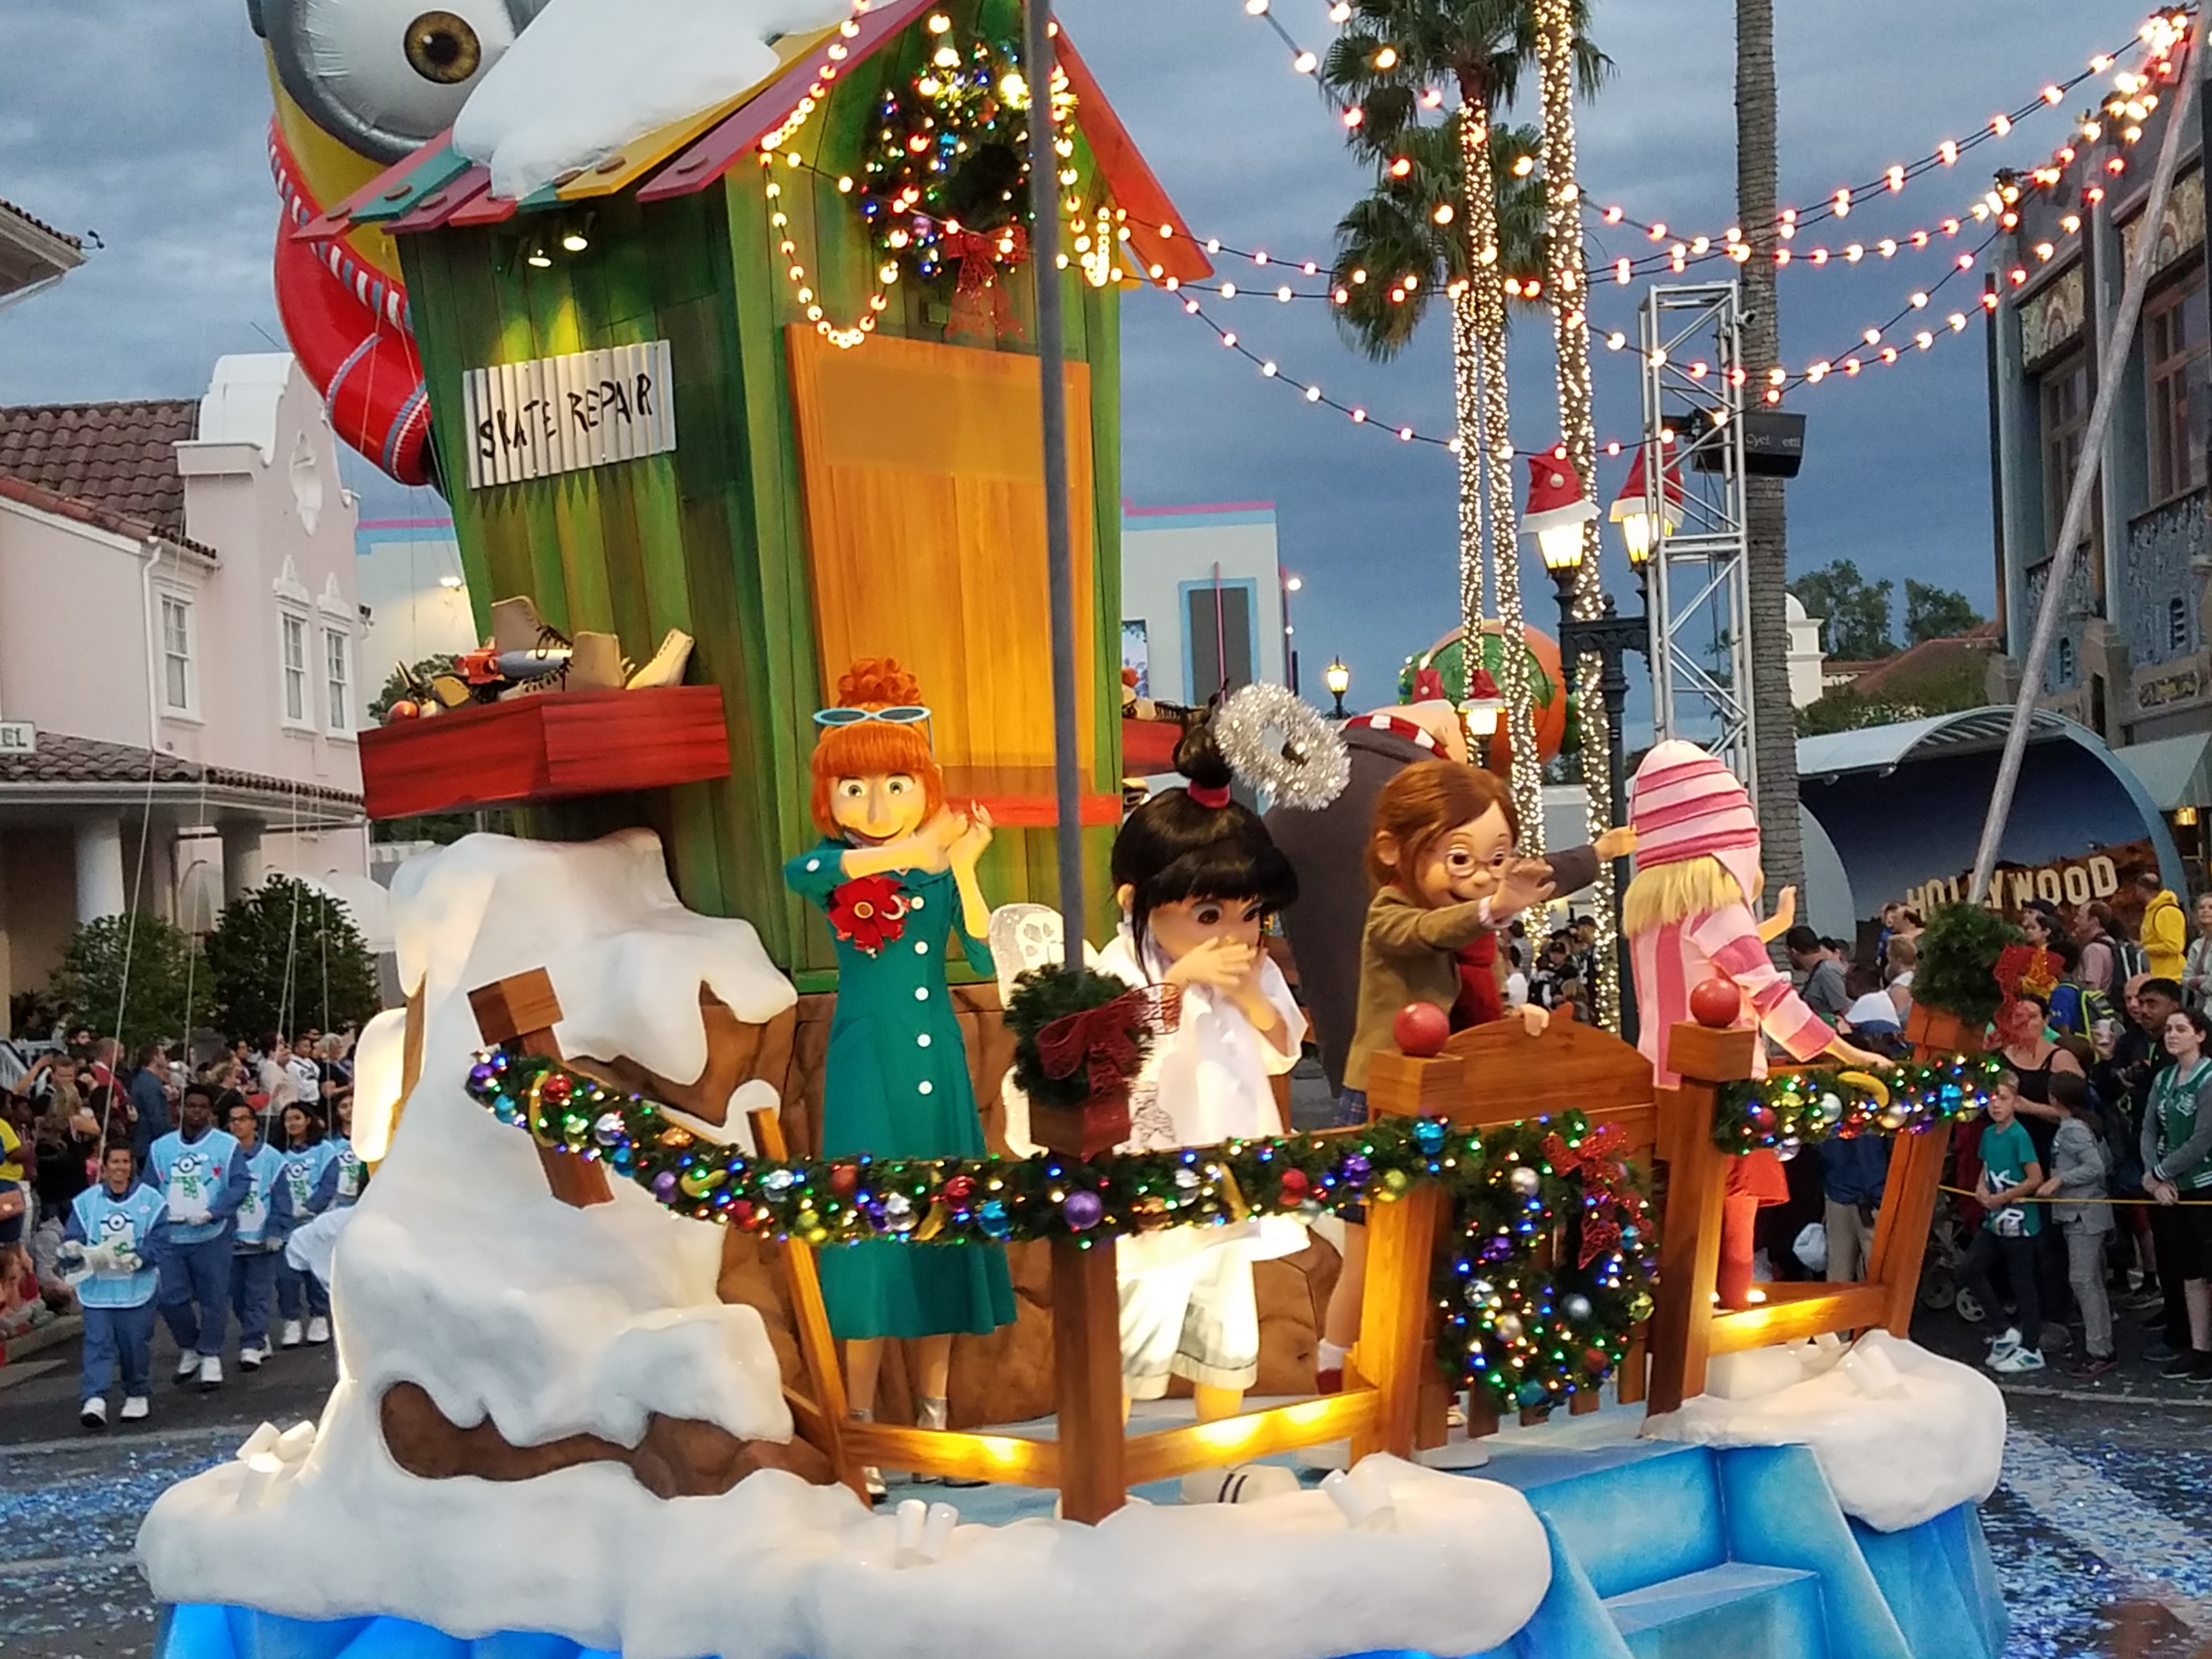 Universal Studios Christmas.It S Christmas At Universal Orlando Unofficial Universal